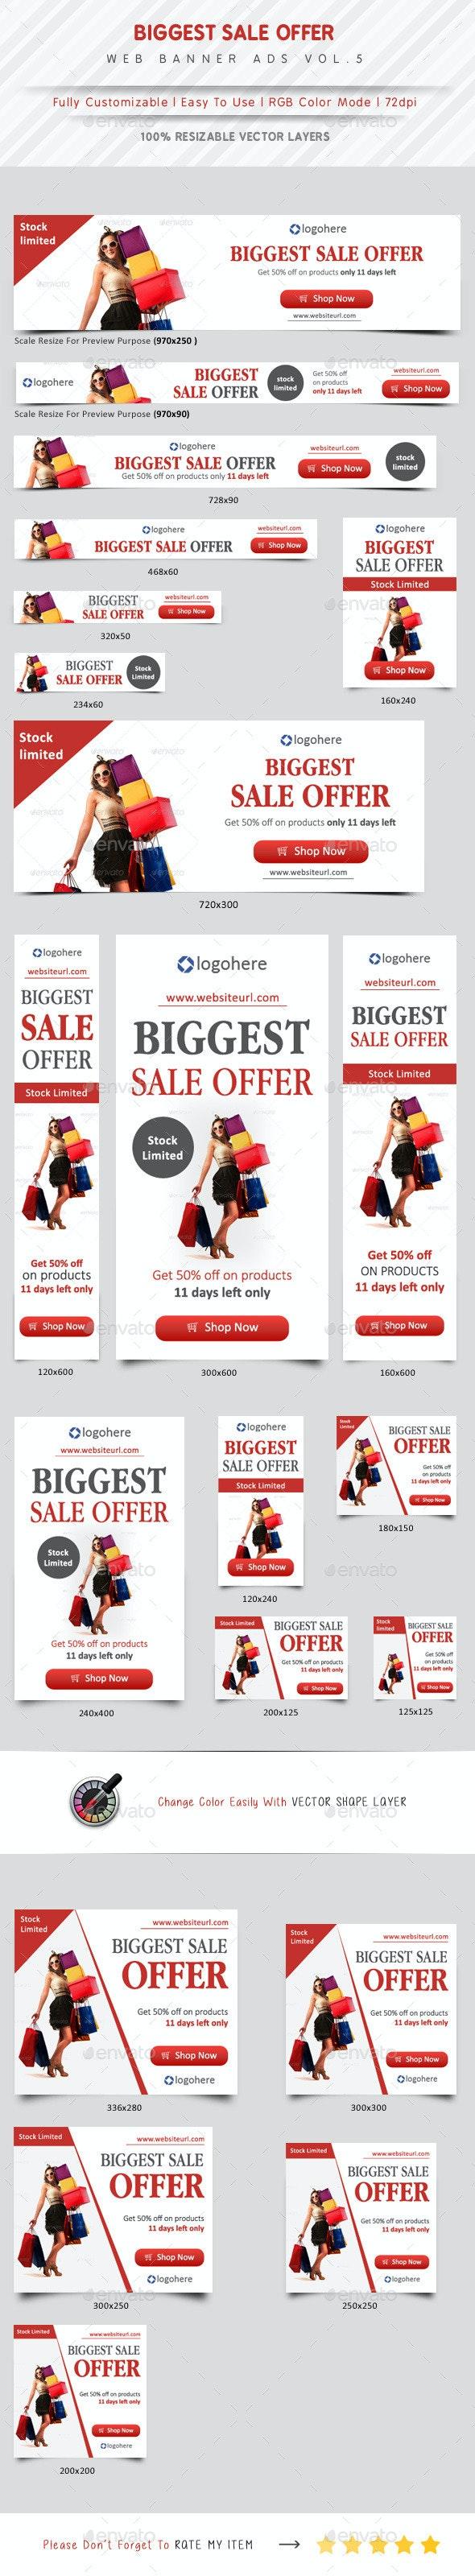 Biggest Sale Offer Web Banner Vol.5 - Banners & Ads Web Elements